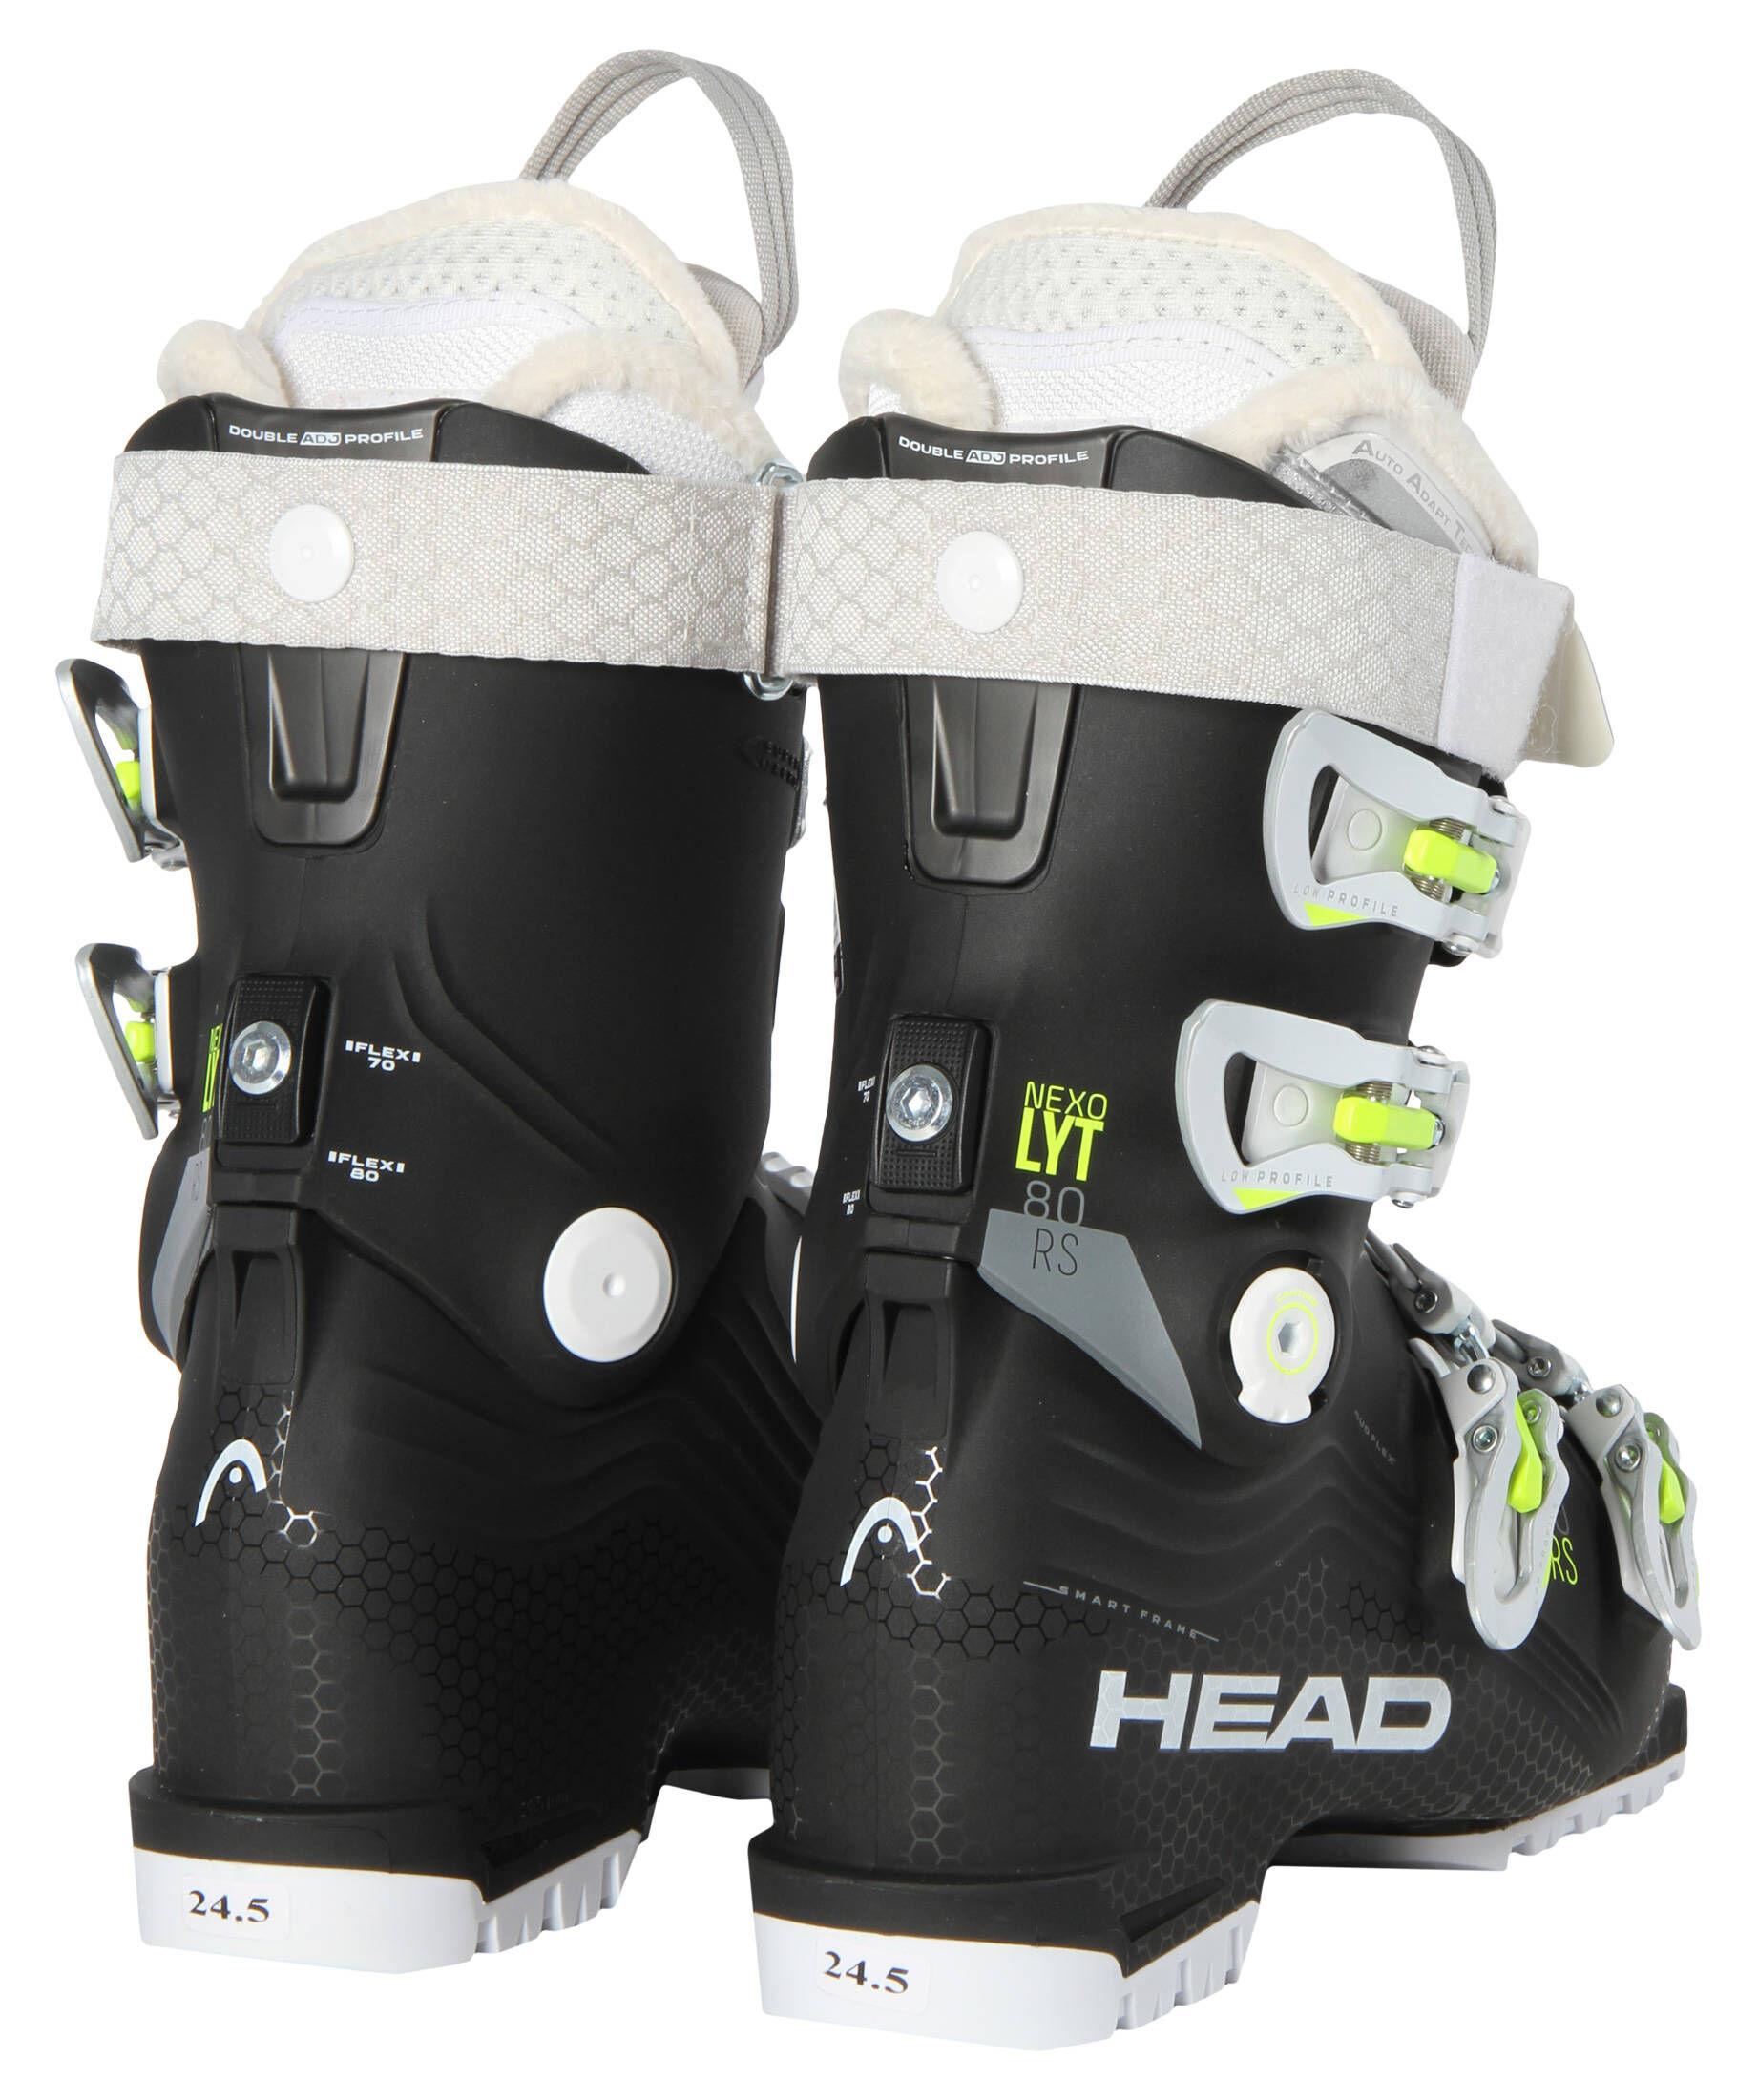 HEAD Damen Skistiefel Nexo LYT 80 RS